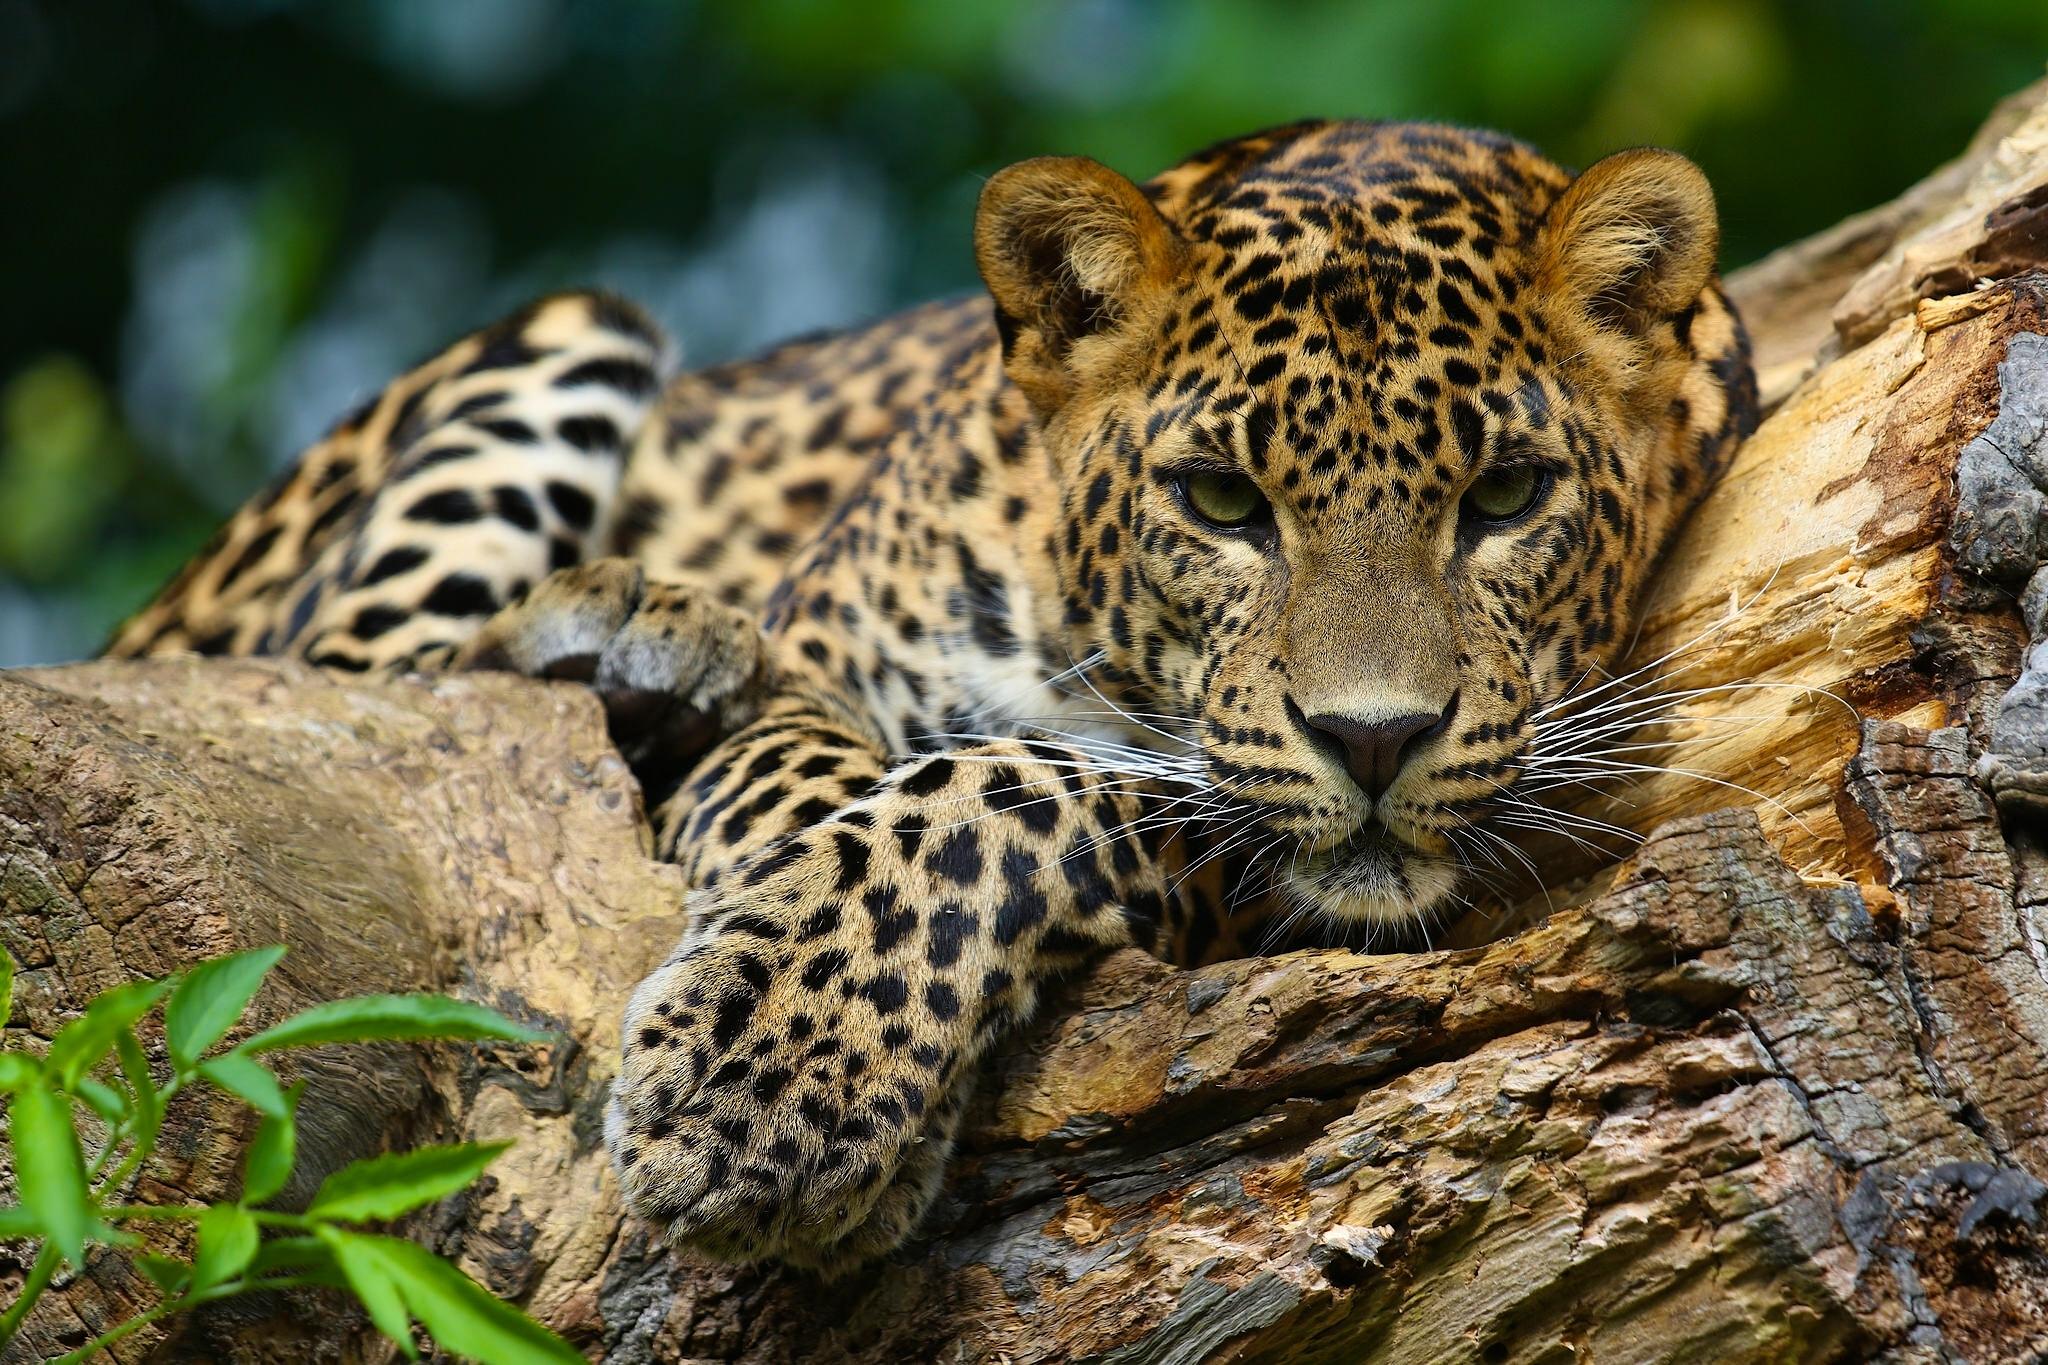 Cheetah Wallpaper Hd Jaguar Full Hd Fond D 233 Cran And Arri 232 Re Plan 2048x1365